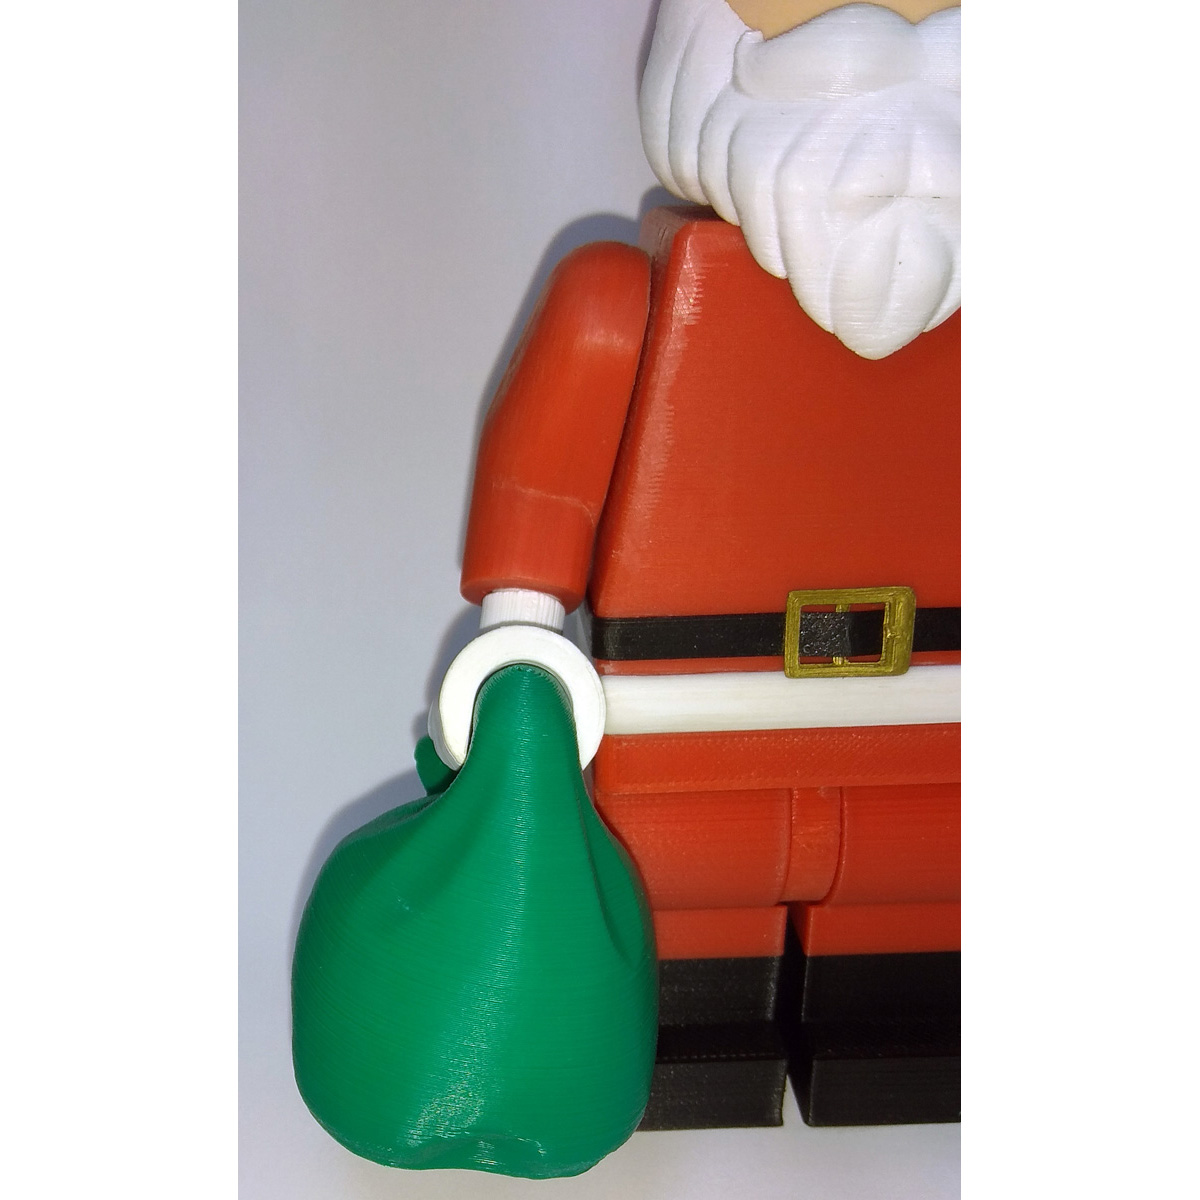 Lego_Minifig_-_Santa_Clause_9.jpg Download free STL file Jumbo Christmas - Santa Claus • 3D printer template, HowardB